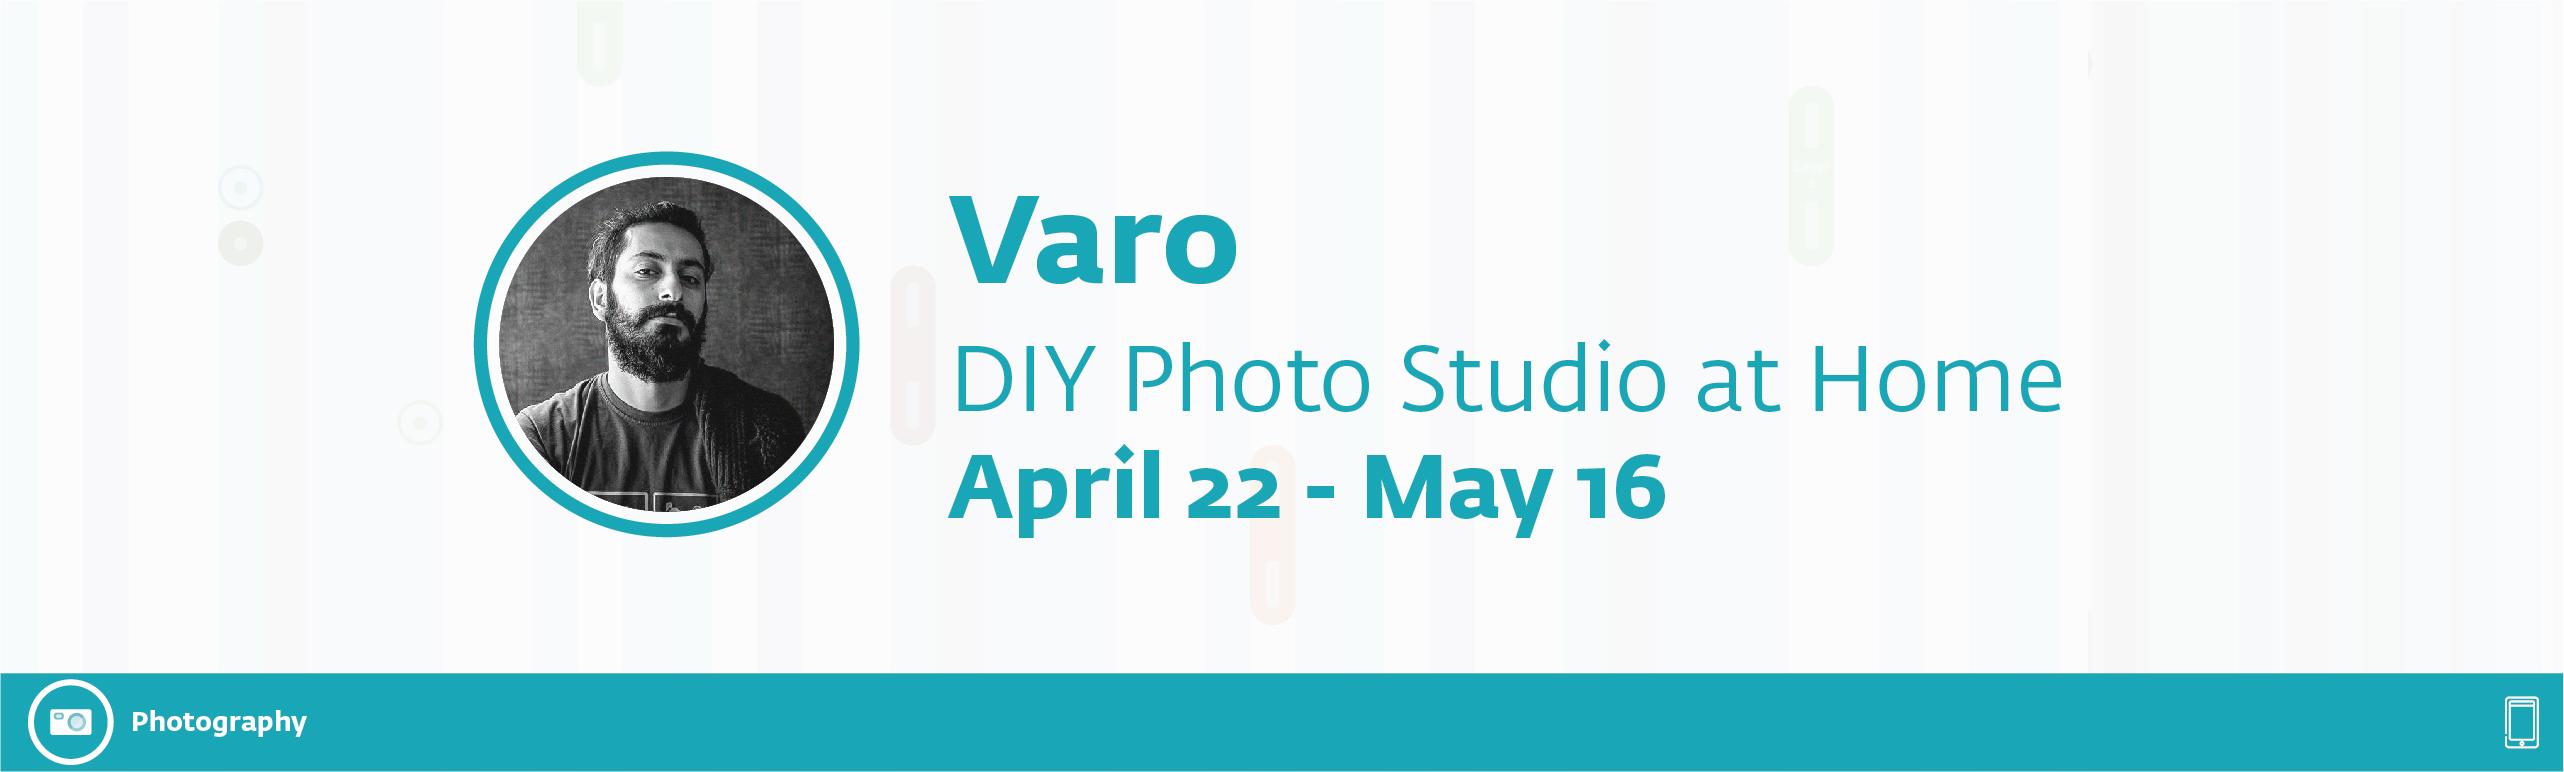 each page 1 13 - A Home DIY Photo Studio